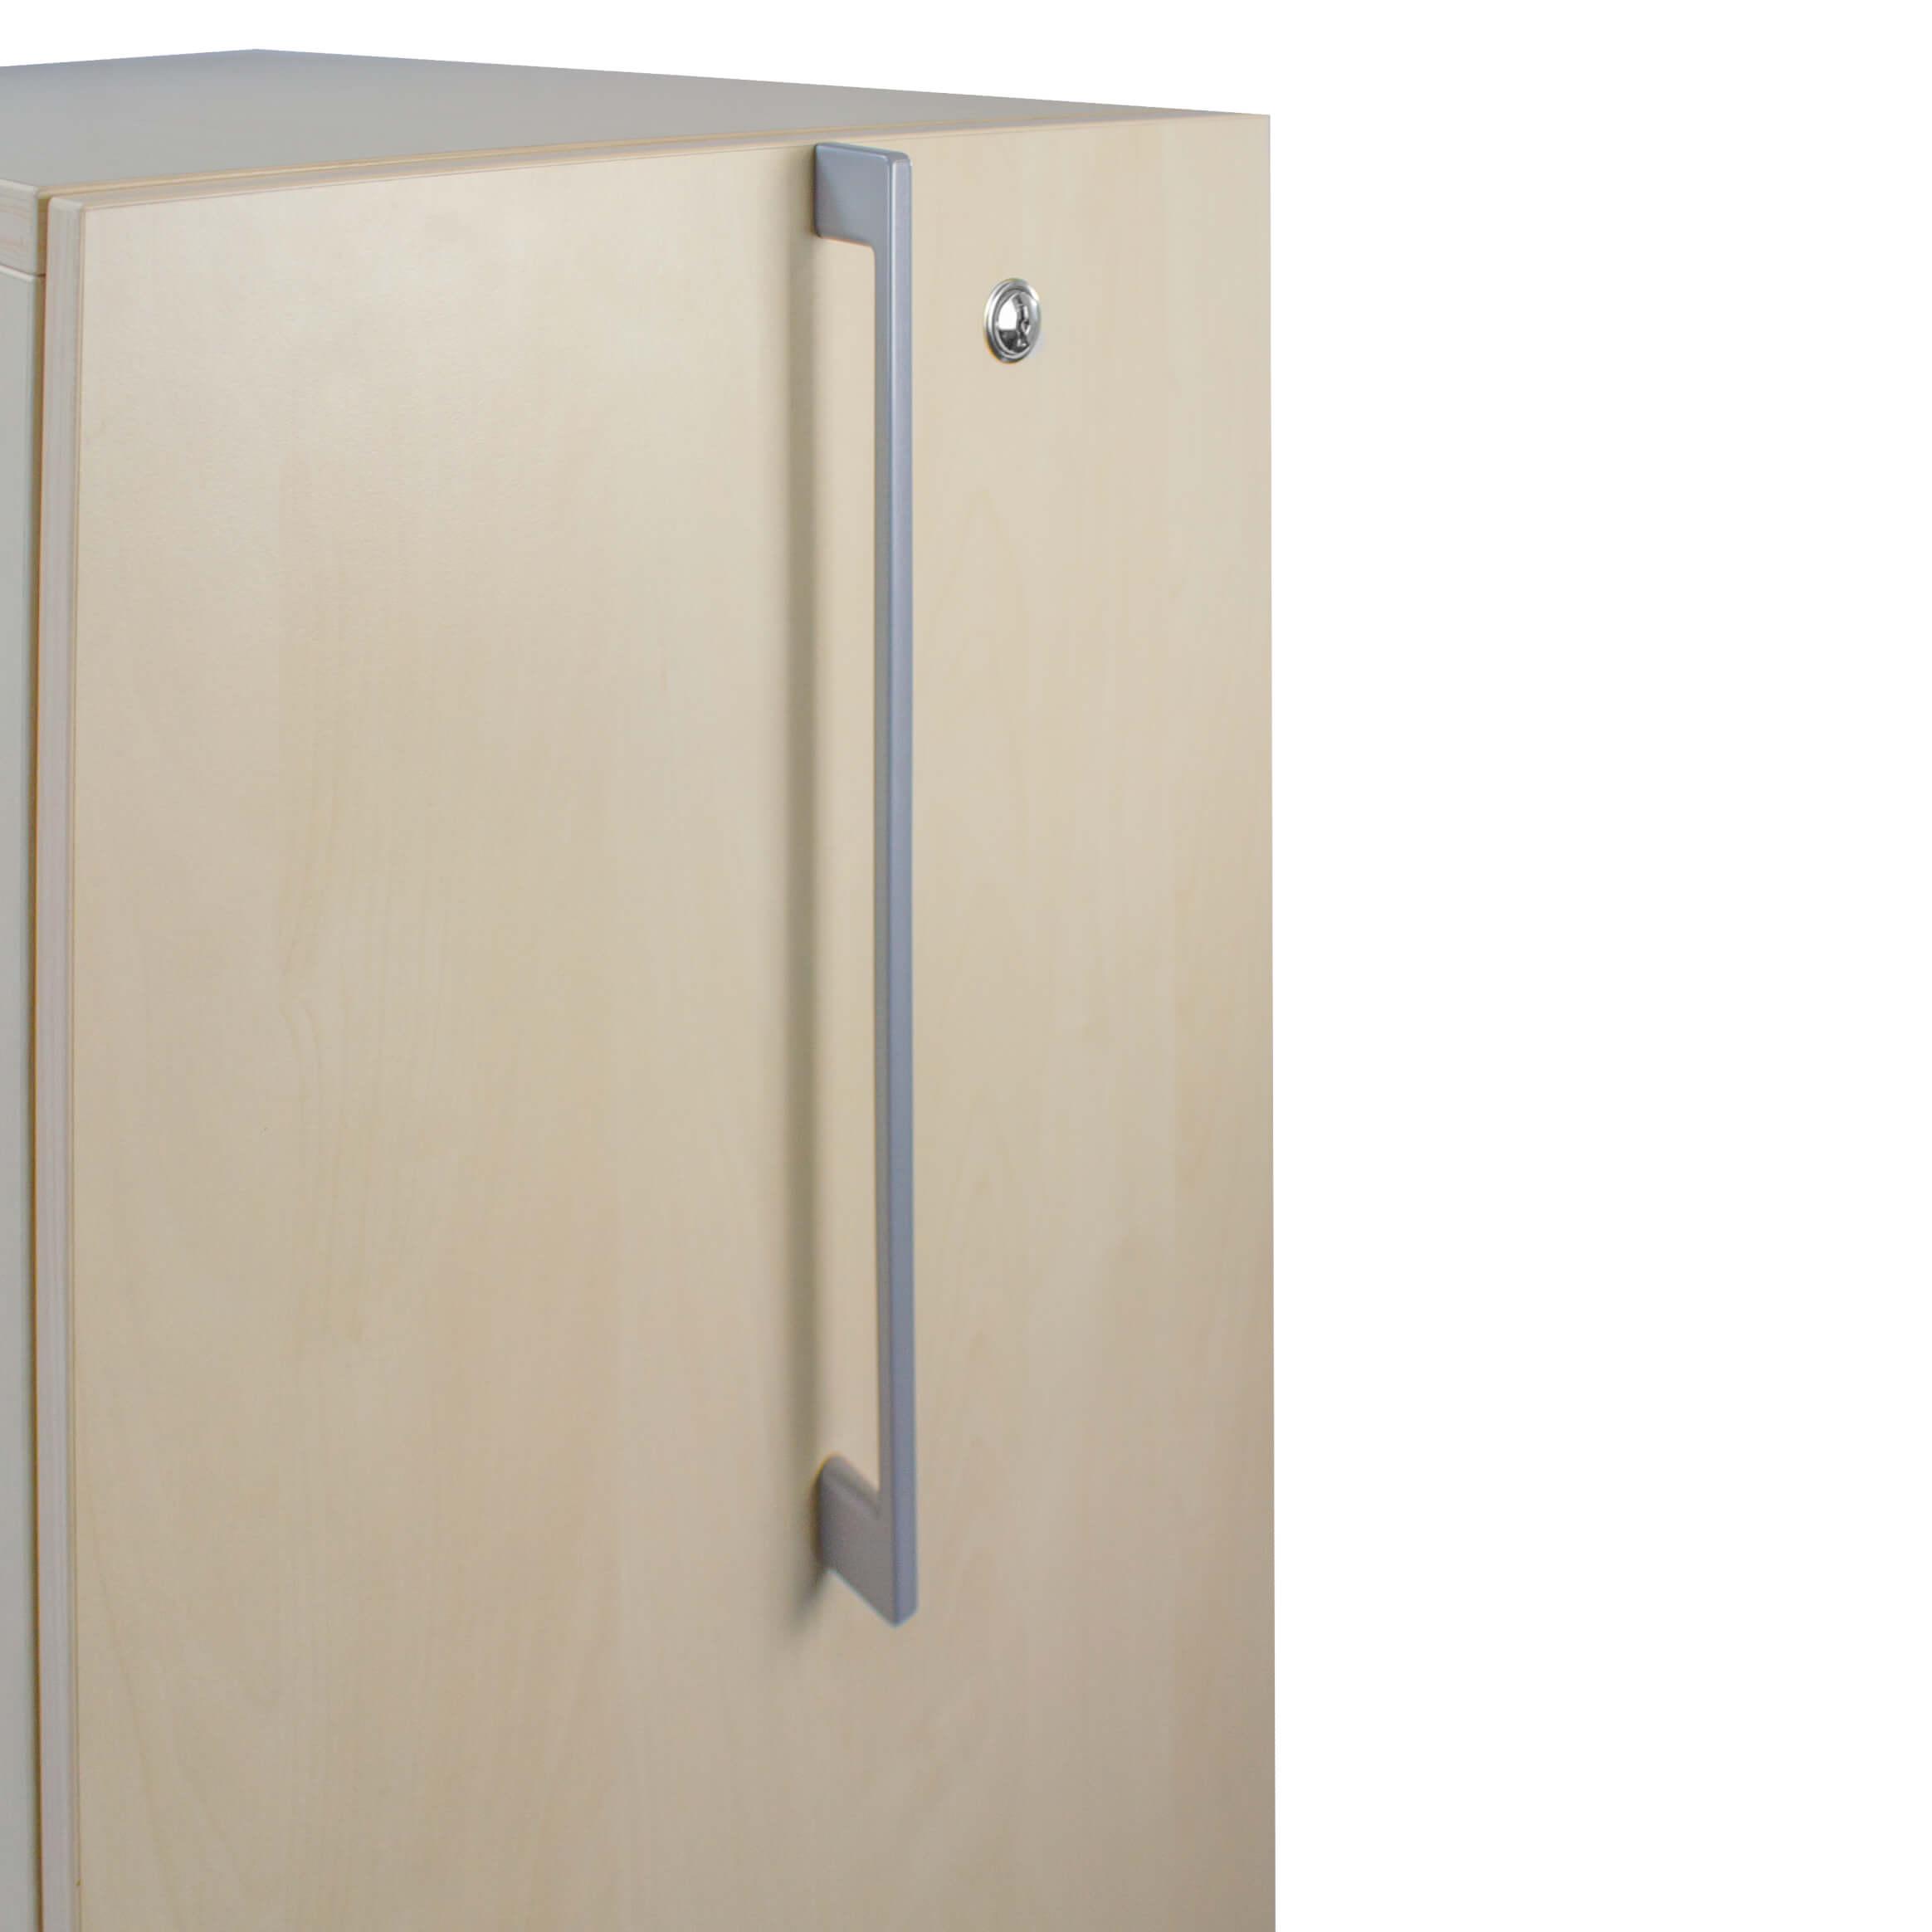 BOXI Apothekerschrank in Ahorn 80 x 40 cm, Caddy,Hochcontainer, Container